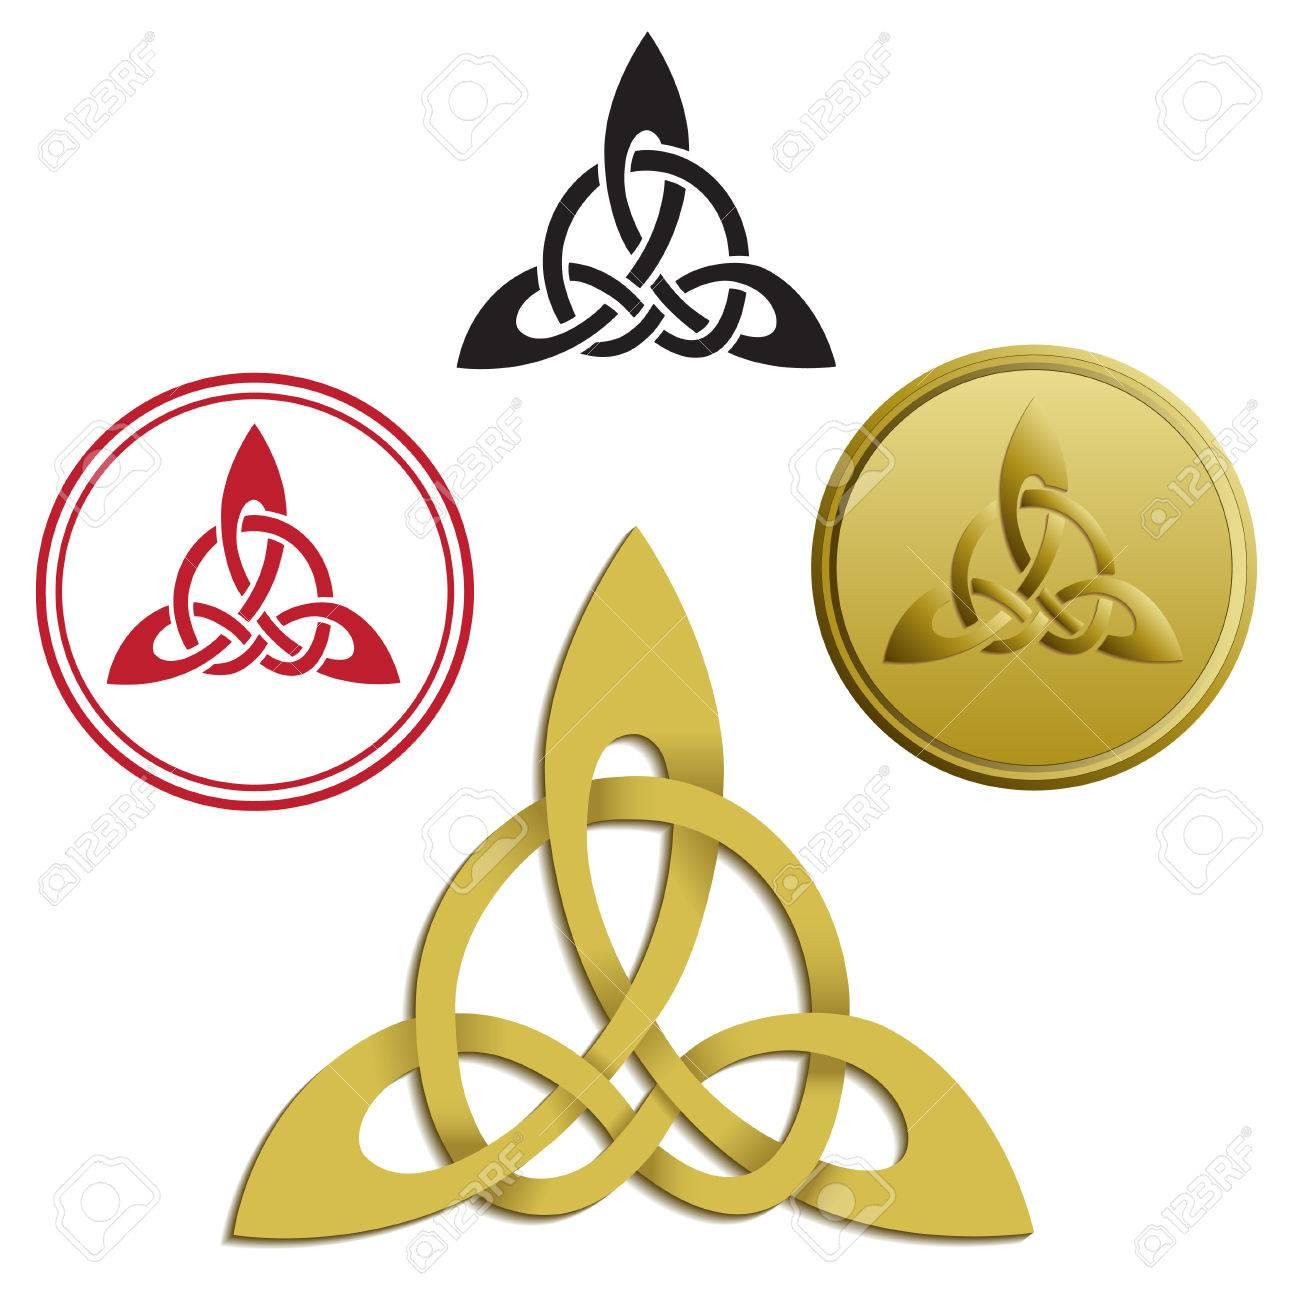 Triskele Triskelion Ancient Greece And Celtic Symbol Vector